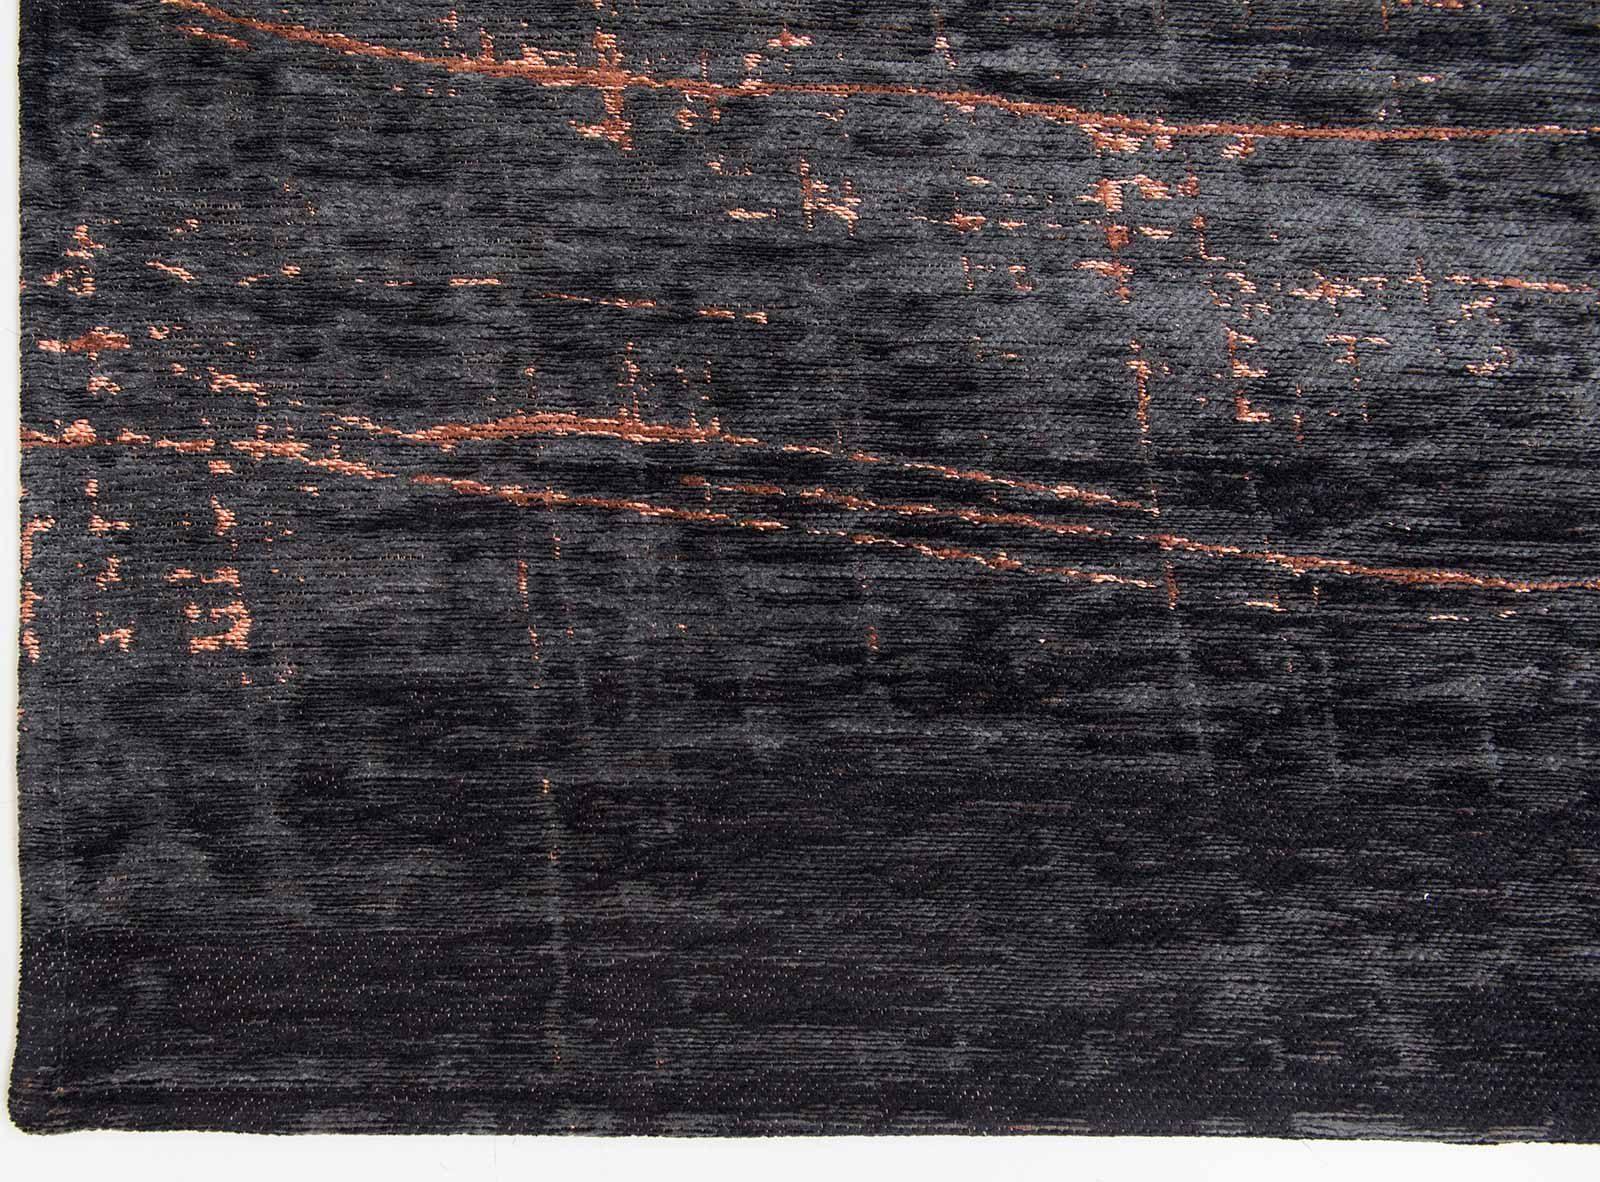 rugs Louis De Poortere LX8925 Mad Men Griff Soho Copper corner